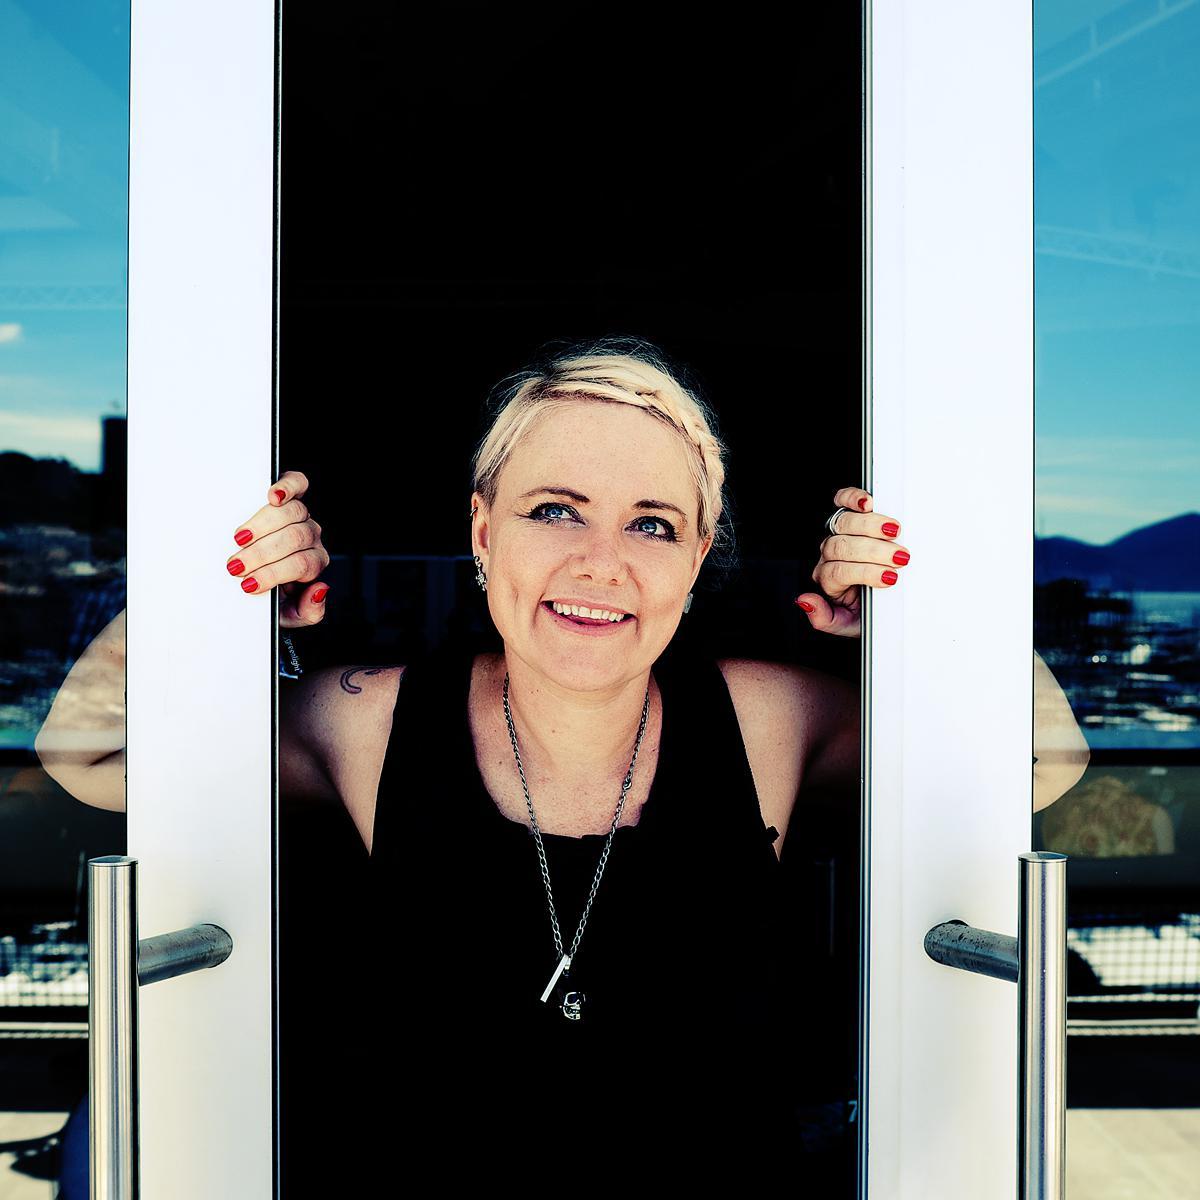 Creative Corporate Portrait of Laura Jordan Bambach by Julian Hanford